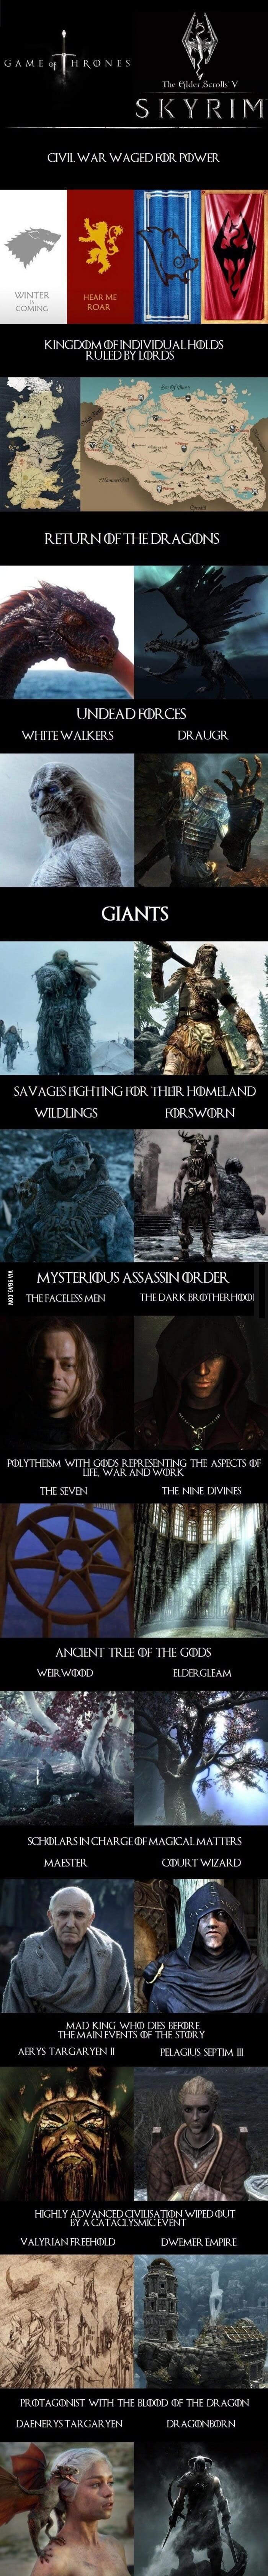 skyrim childporn Game Of Thrones Is Just Like Skyrim